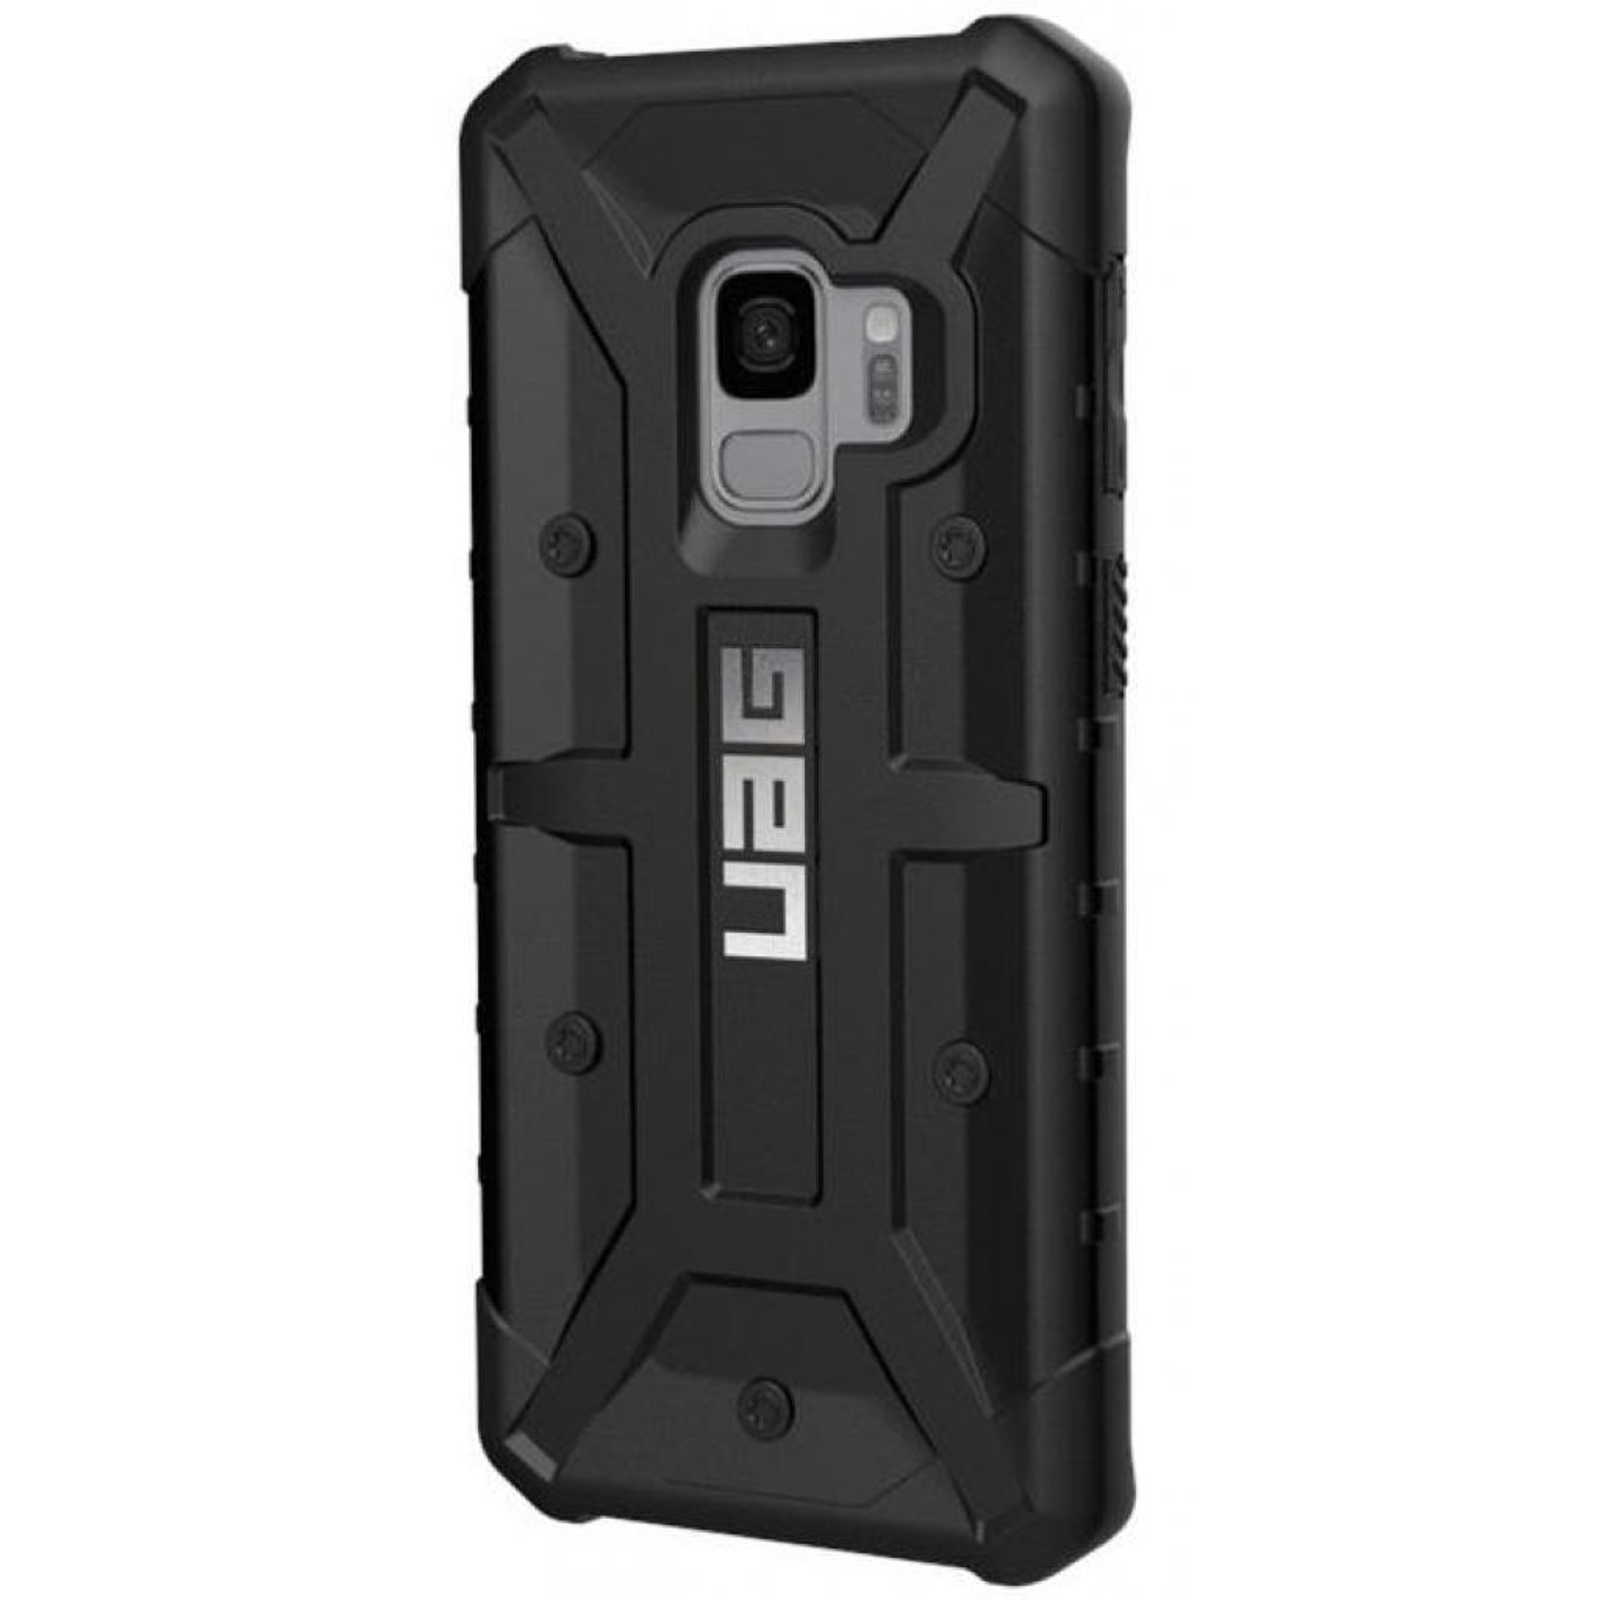 Чехол для моб. телефона Uag Galaxy S9 Pathfinder Black (GLXS9-A-BK) изображение 2